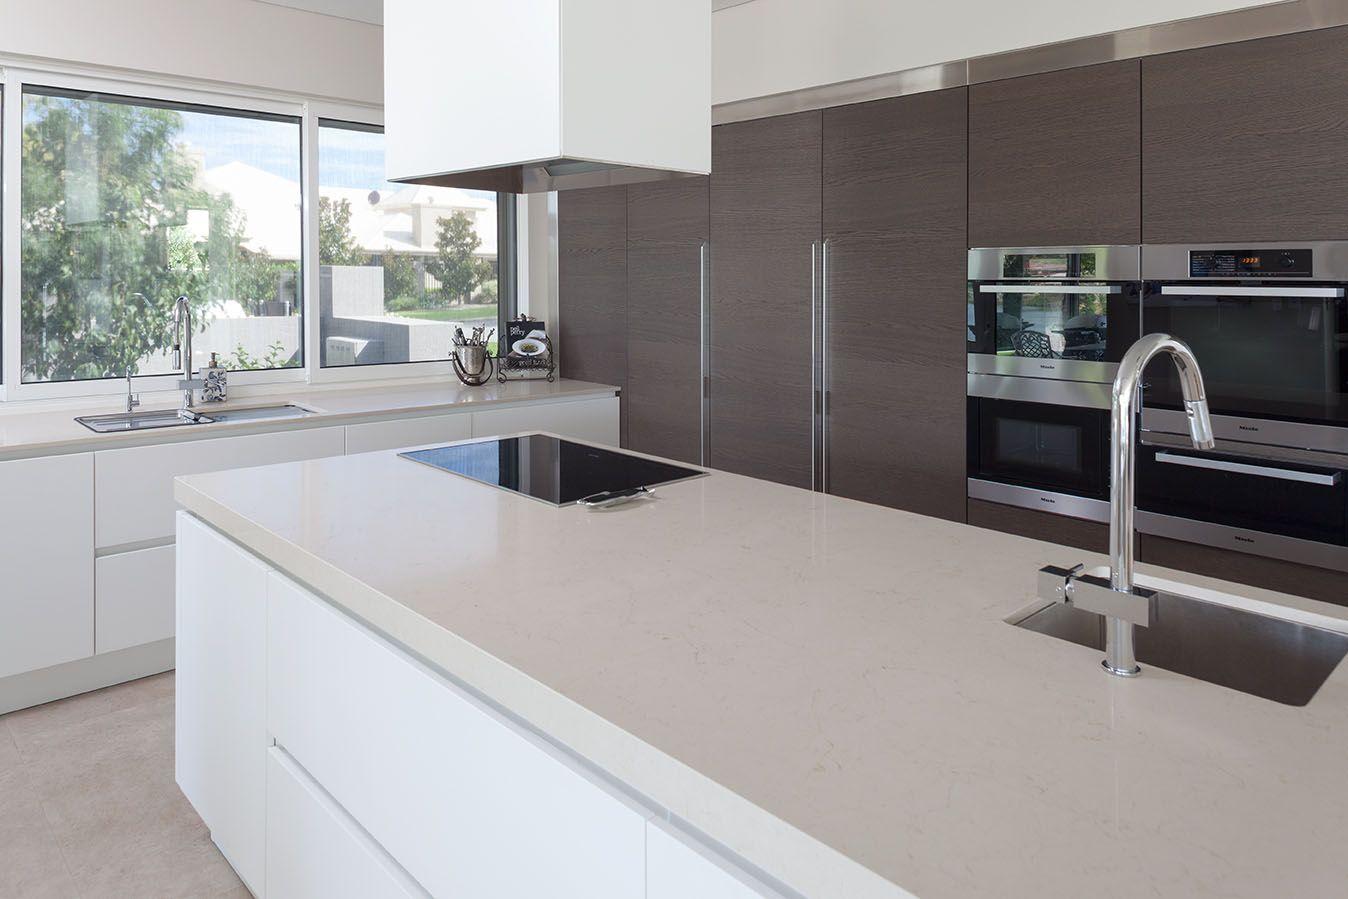 100 Incroyable Idées Retreat Design Kitchens And Bathrooms